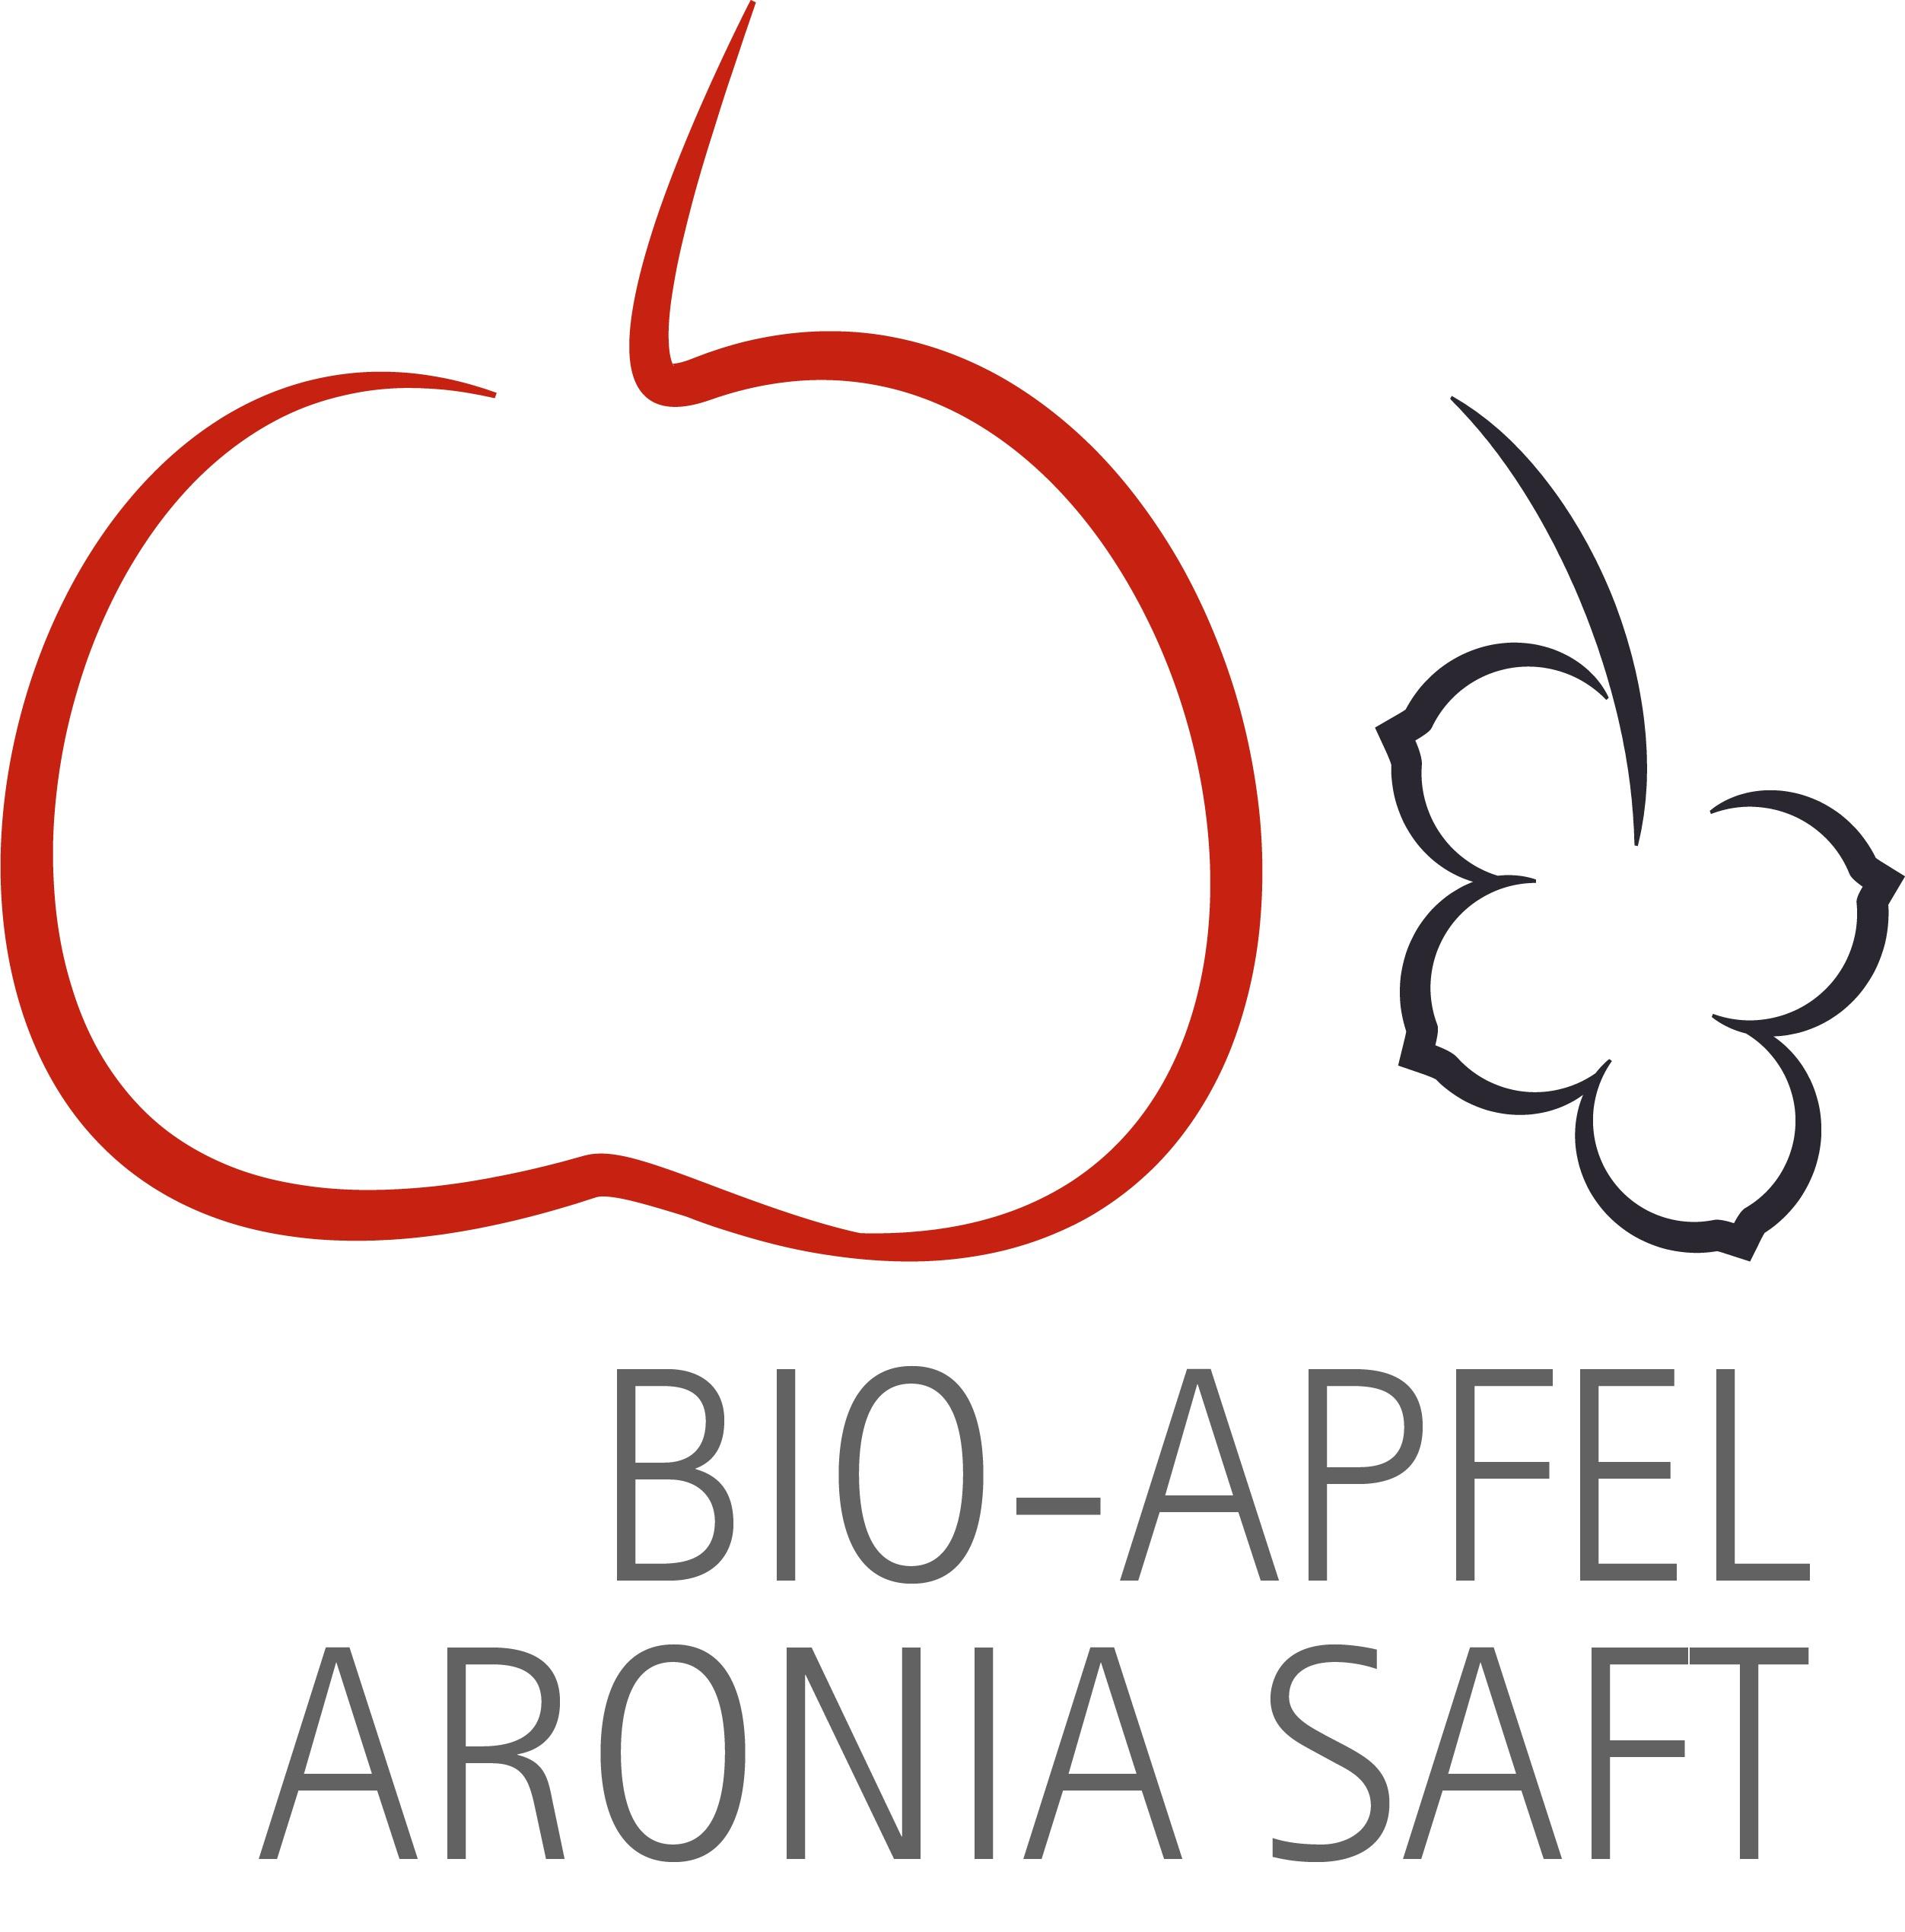 schweighofer_produktlogos-saft-apfel-aronia_201218